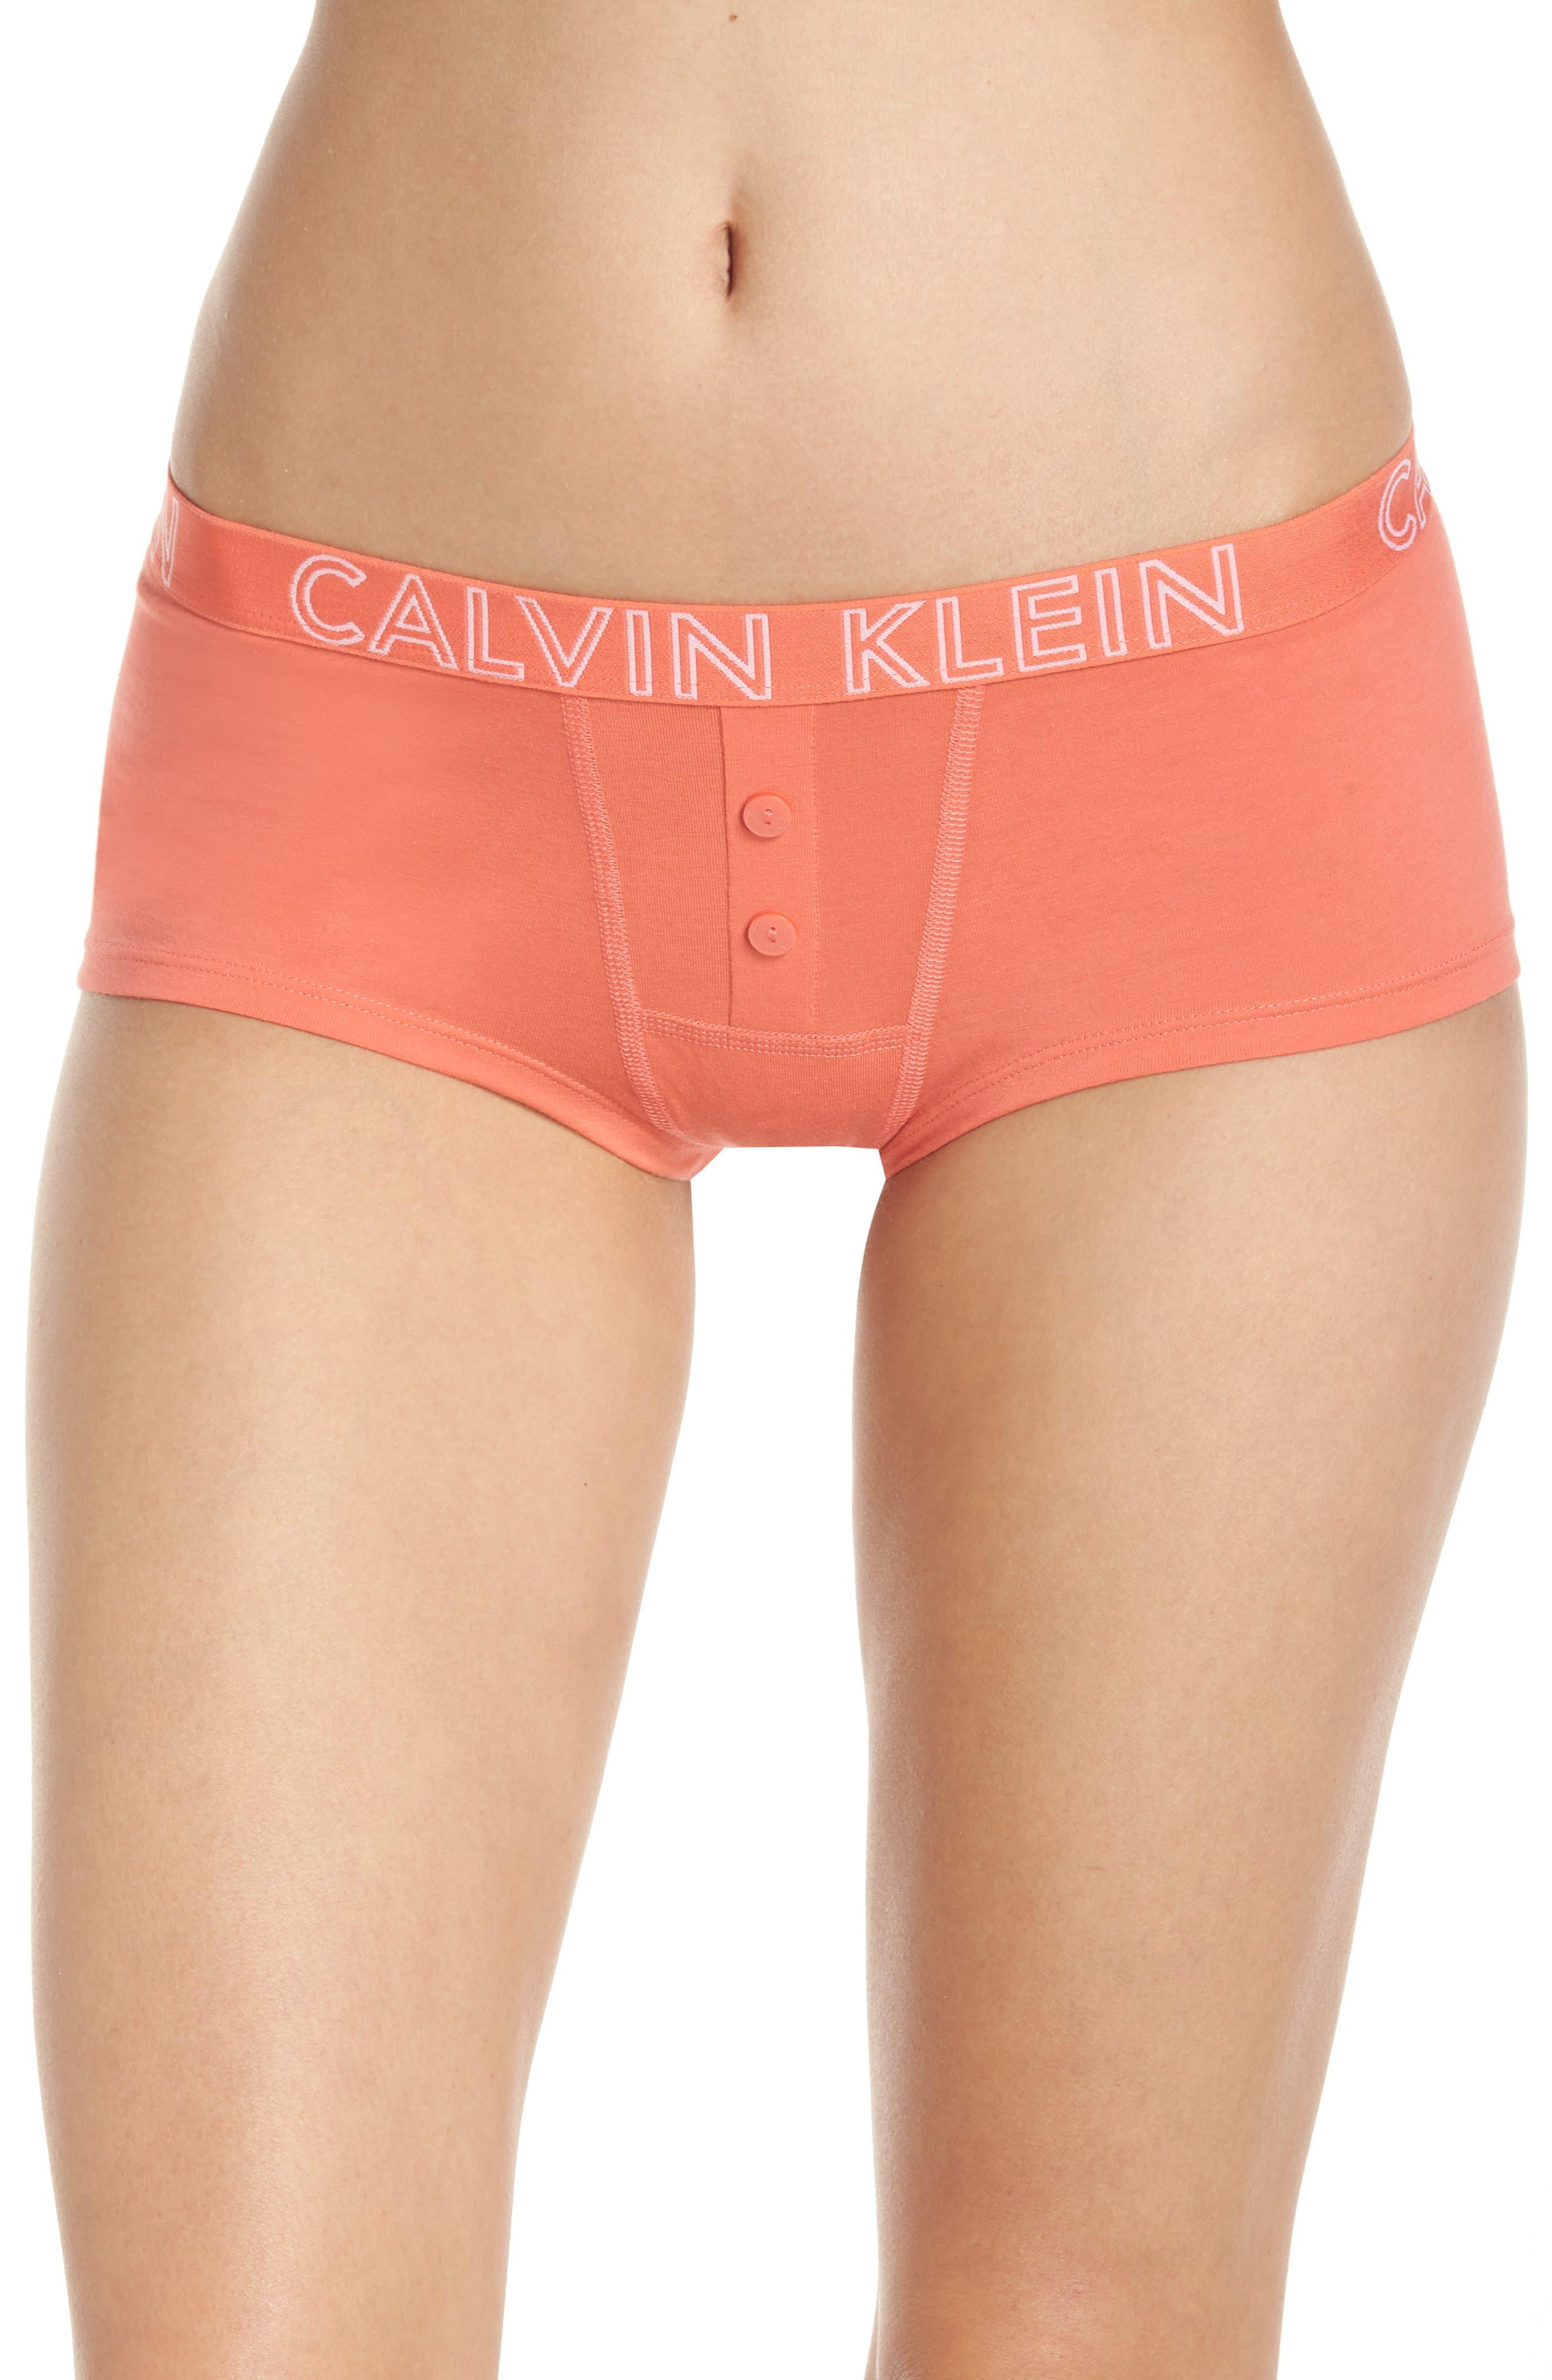 CALVIN KLEIN Ultimate Boyshorts, Main, color, SONATA